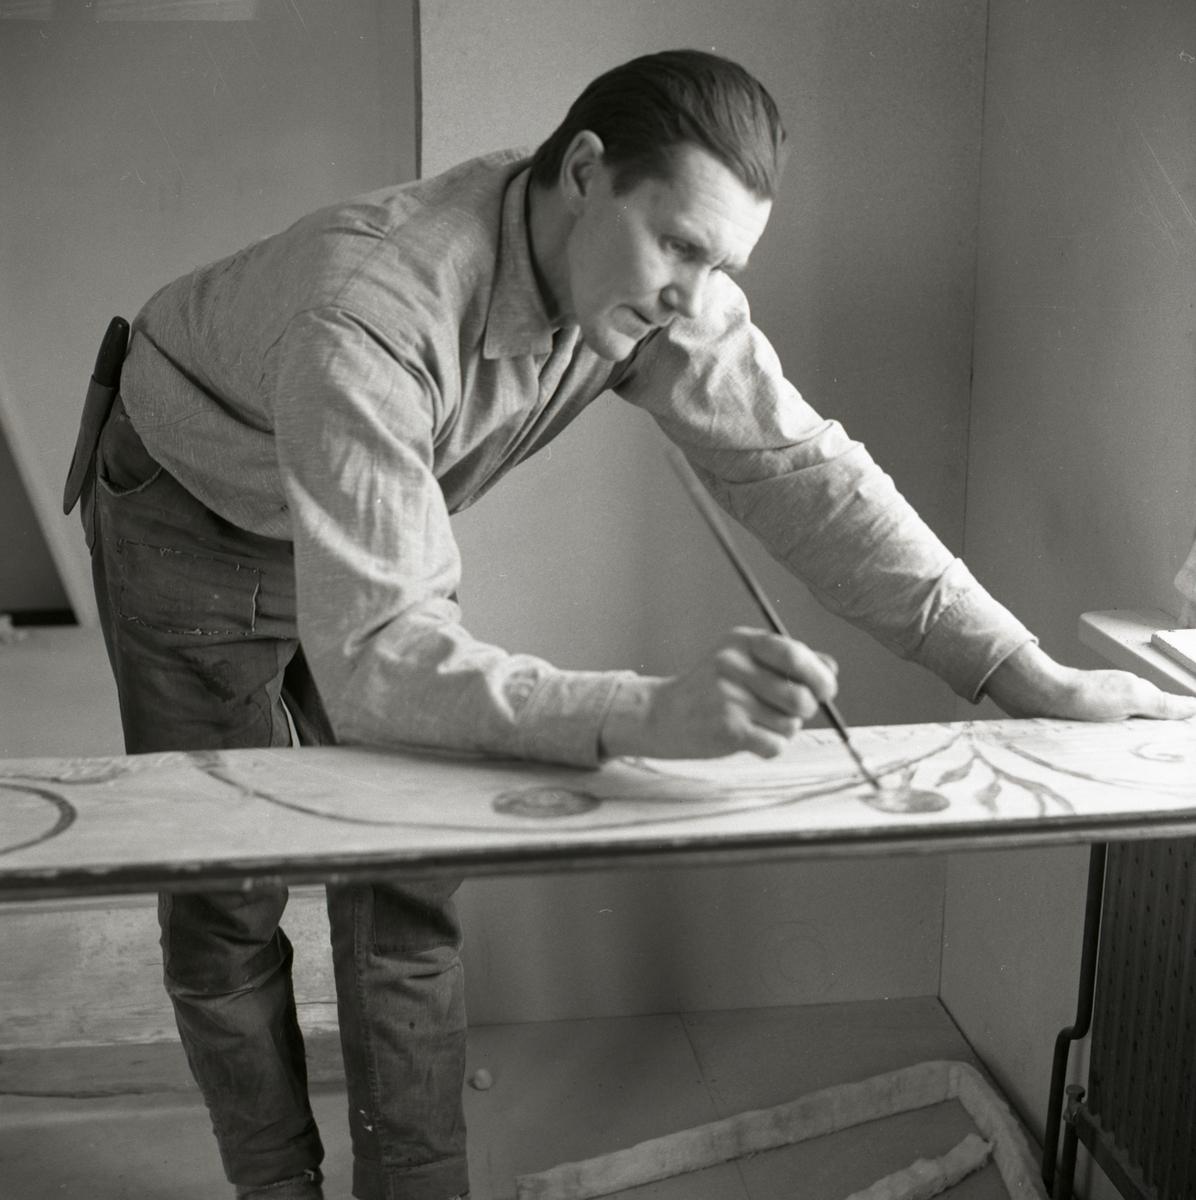 Hilding målar på en takbräda med en pensel, 1968-1969.